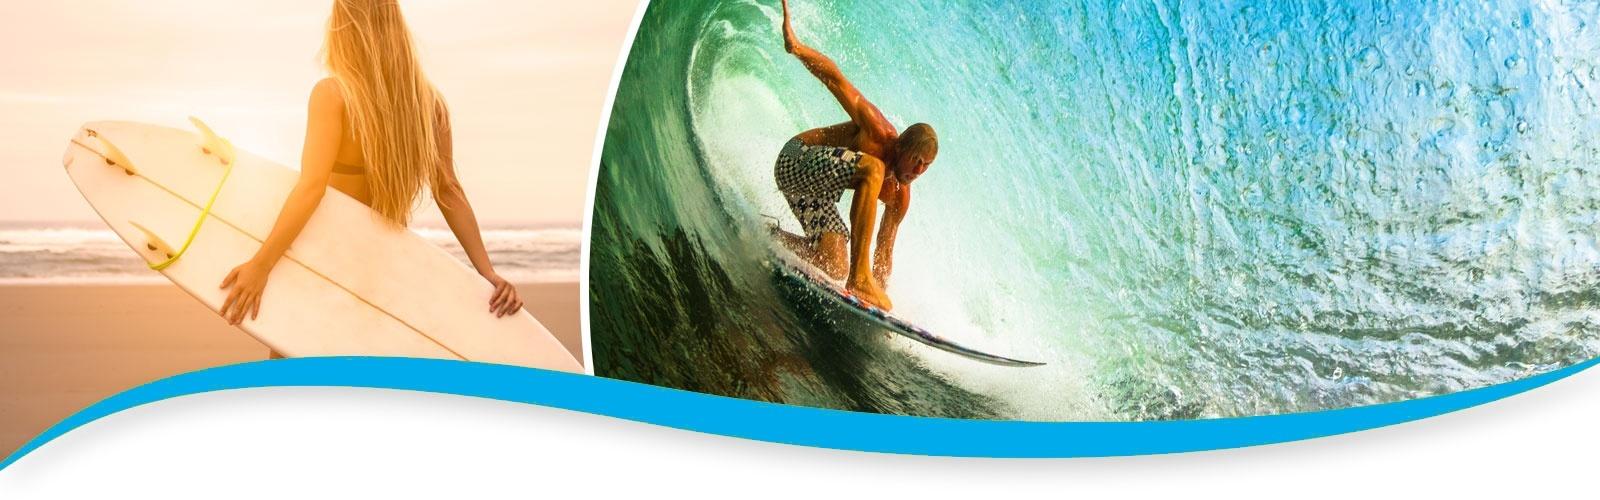 GranPacifica_website_surfing.jpg